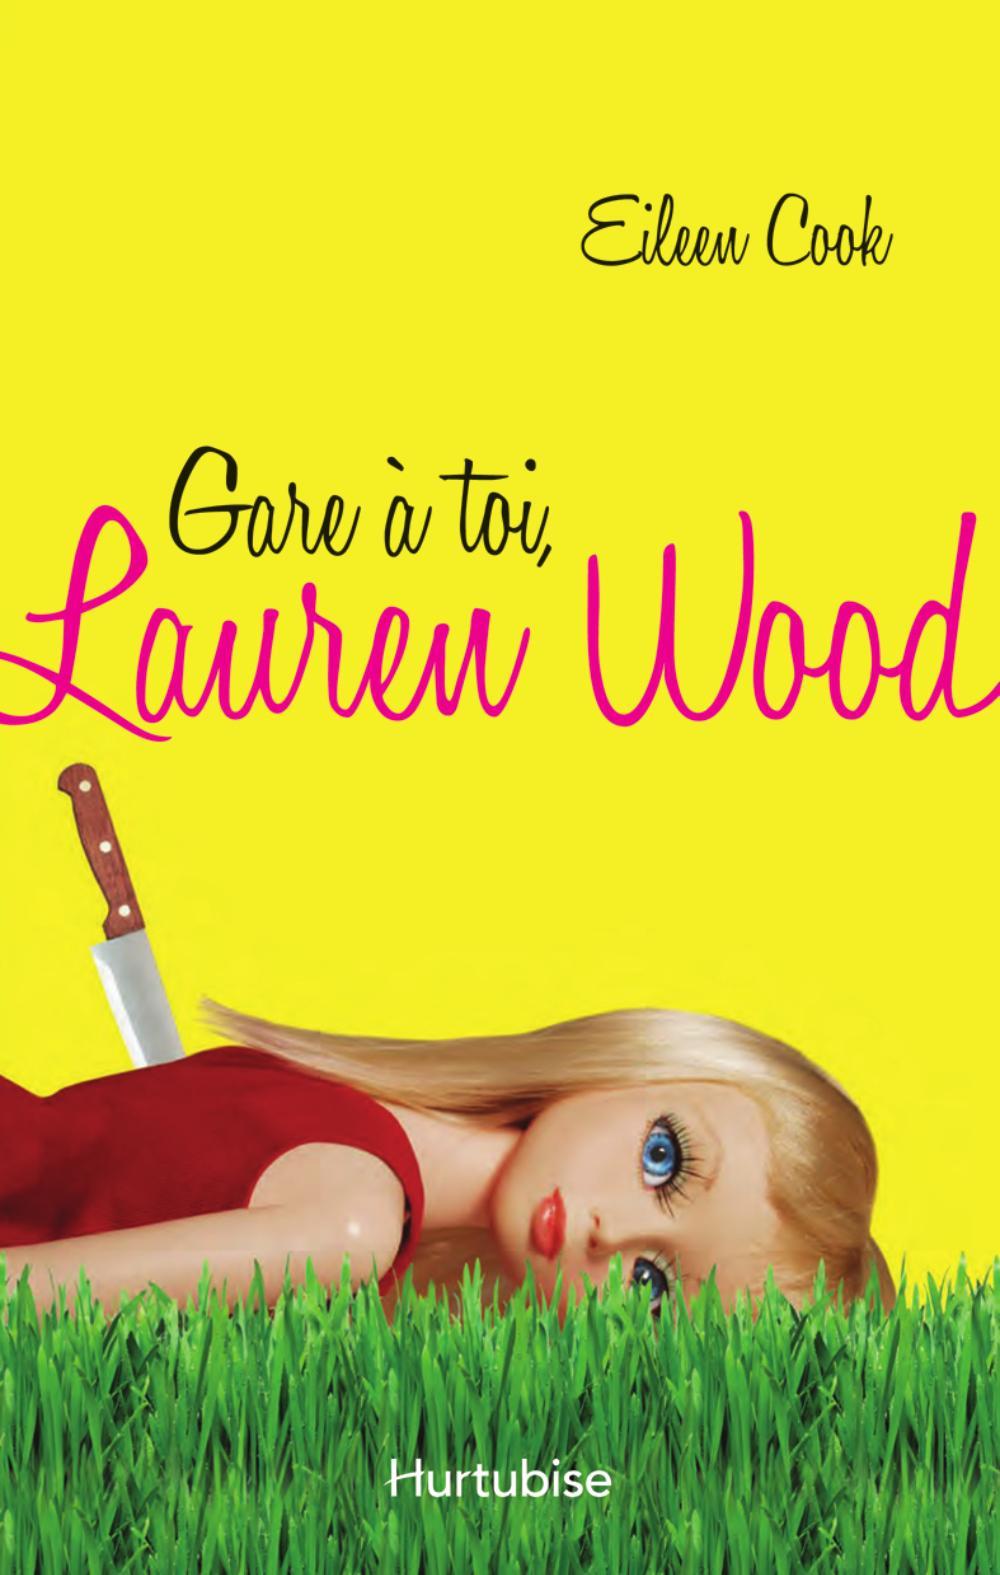 Gare à toi Lauren Wood